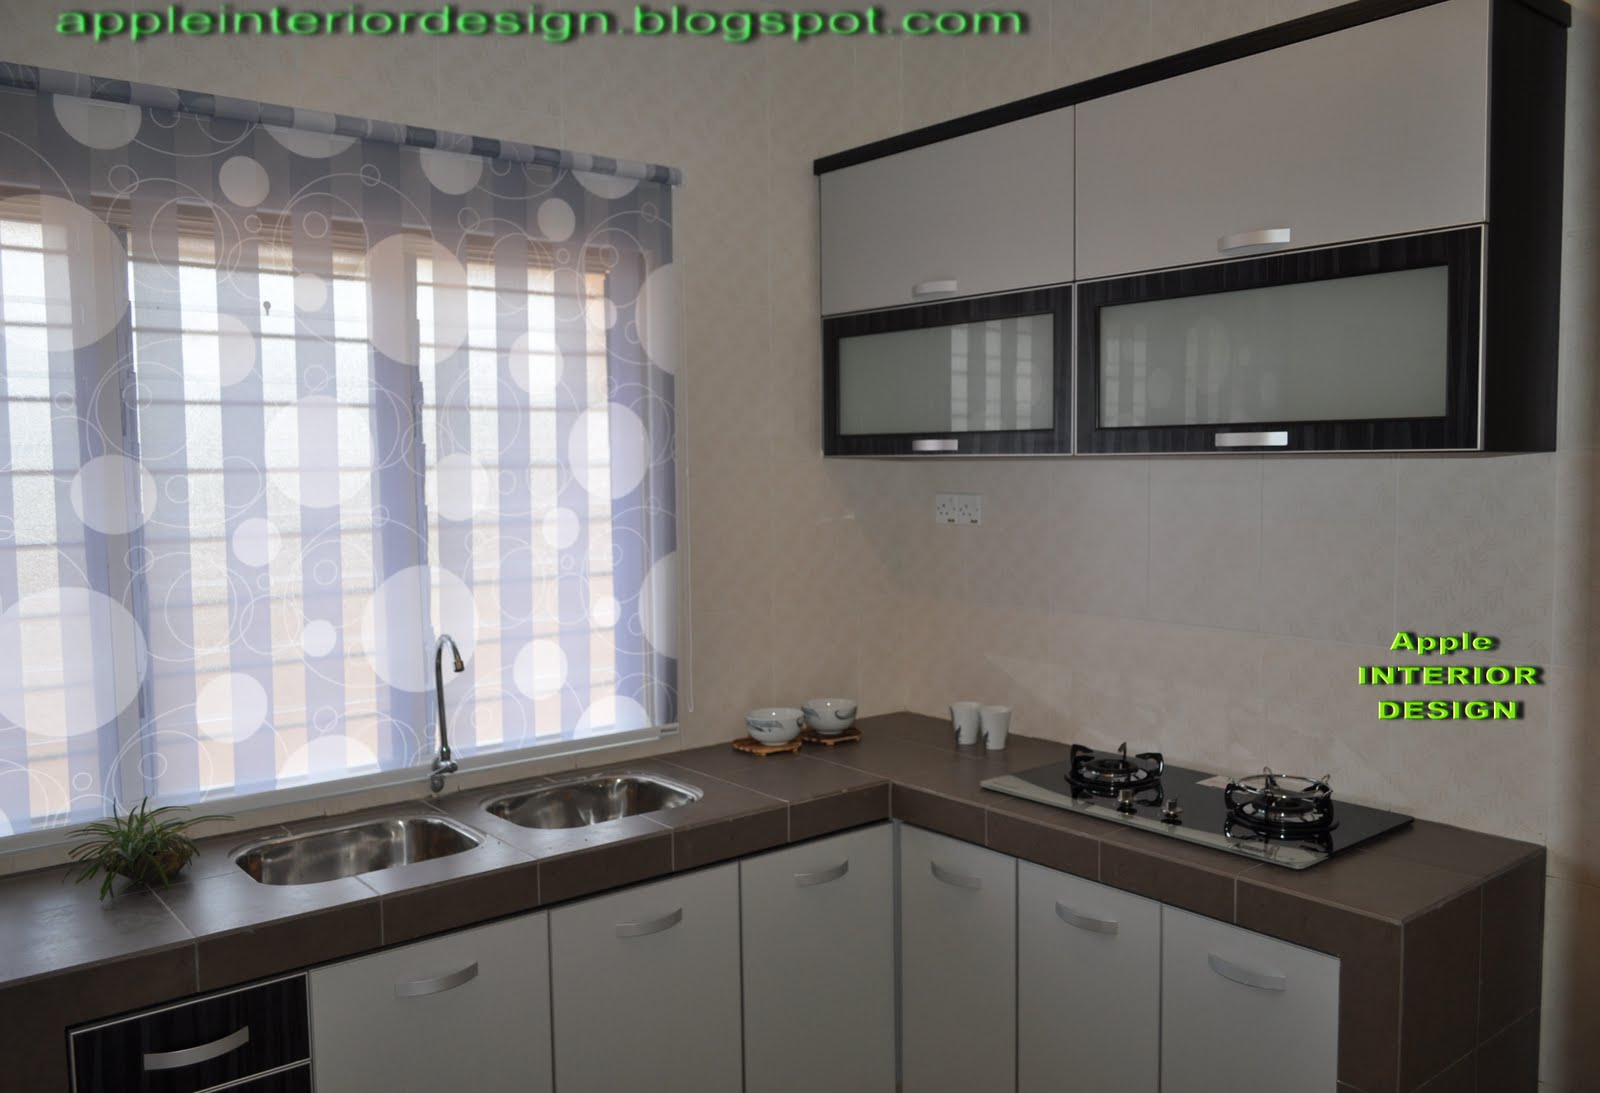 APPLE KITCHEN DESIGNS « Kitchen Renovations